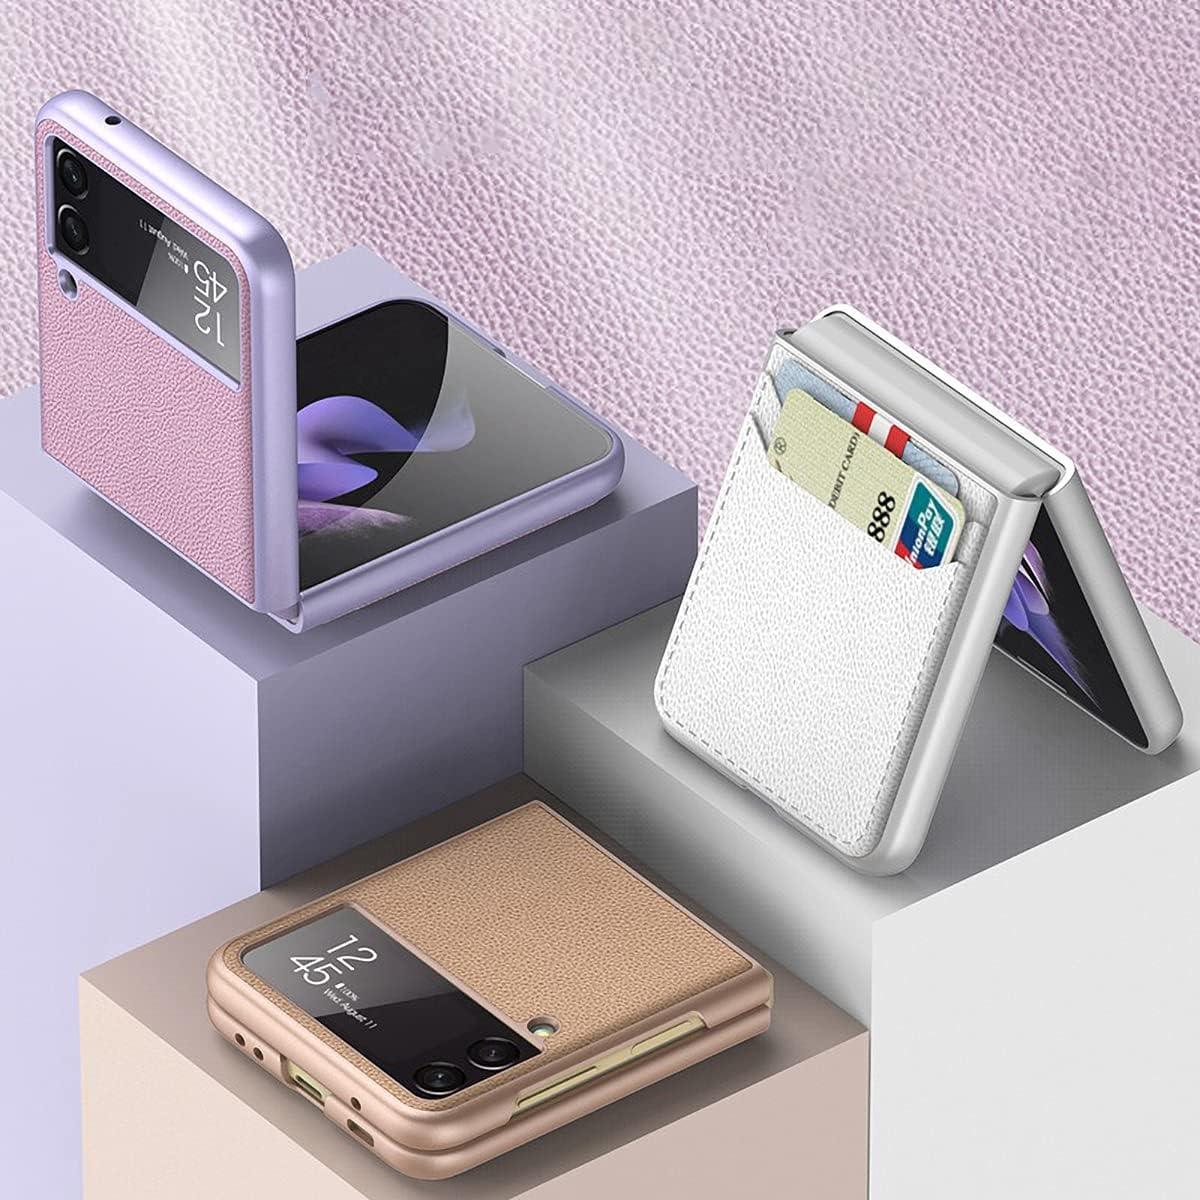 FUTURECASE Galaxy Z Flip 3 Case, Z Flip 3 5G Phone Case, Samsung z Flip 3 Case, PU Leather Wallet Card Holder Case for Samsung Galaxy z Flip 3 Samsung ZFlip 3 ZFlip3 Z Flip3 Coque Funda Cover(Black)